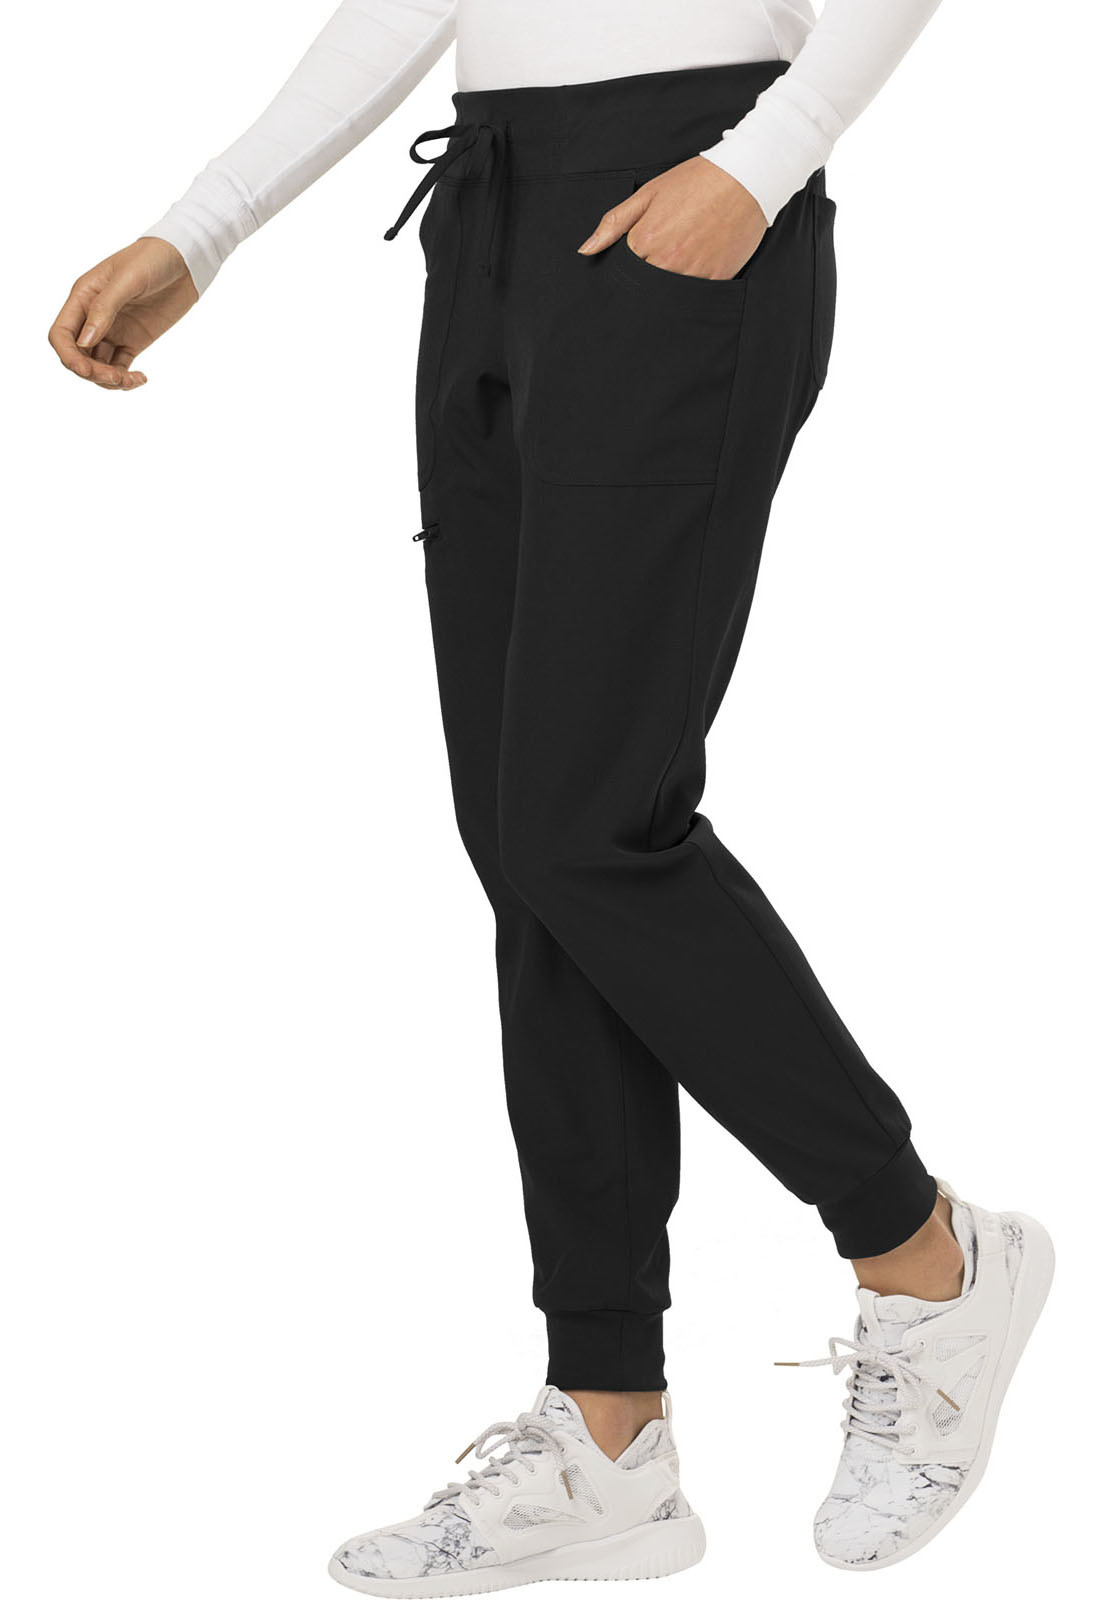 HEART SOUL Black Women's Tall Jogger Scrub Pants HS030T-BCKH